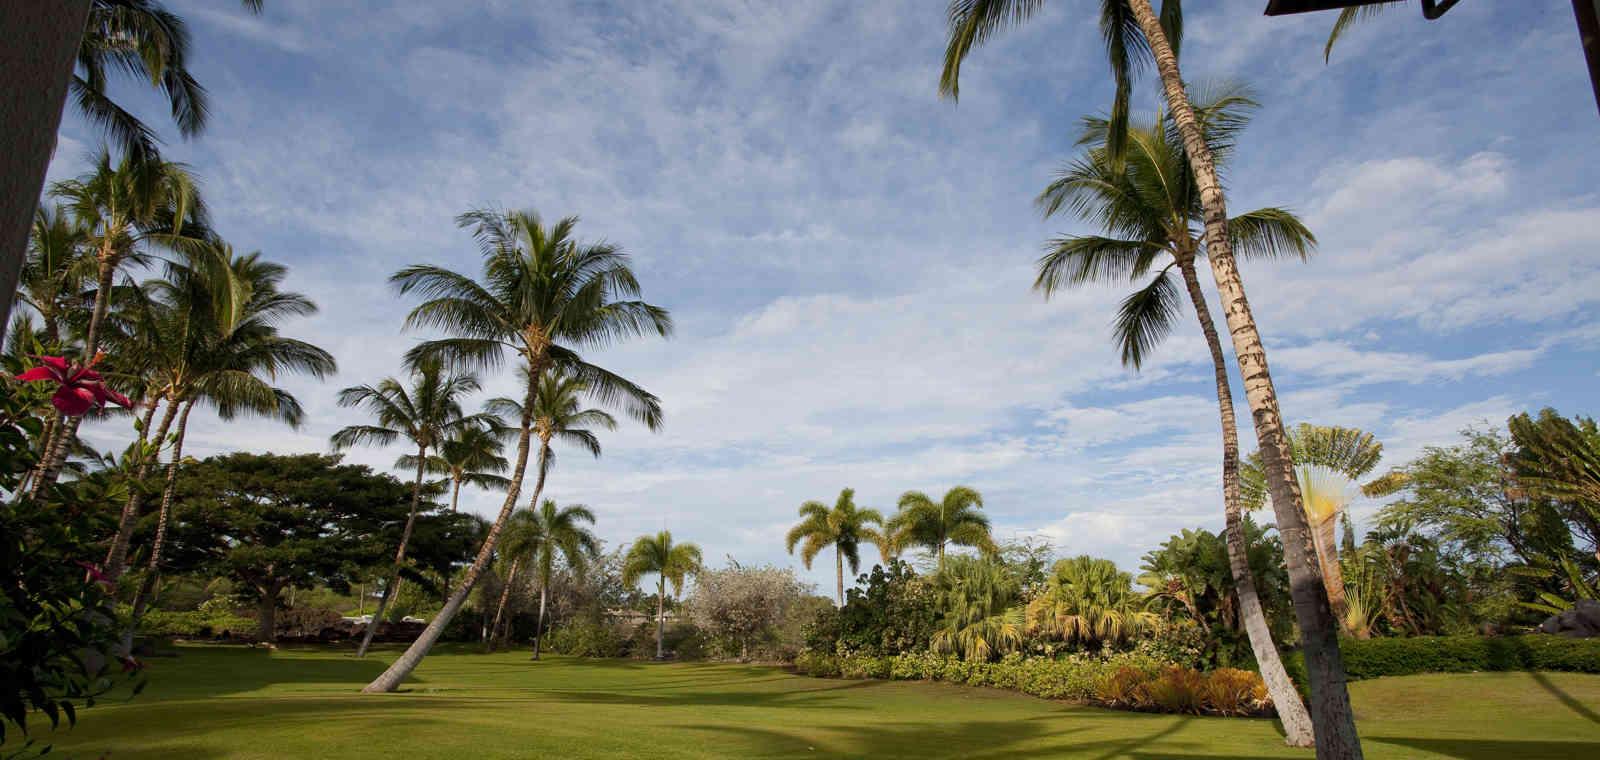 DR_Hawaii_Classic_TI_SYC_P1 (2)